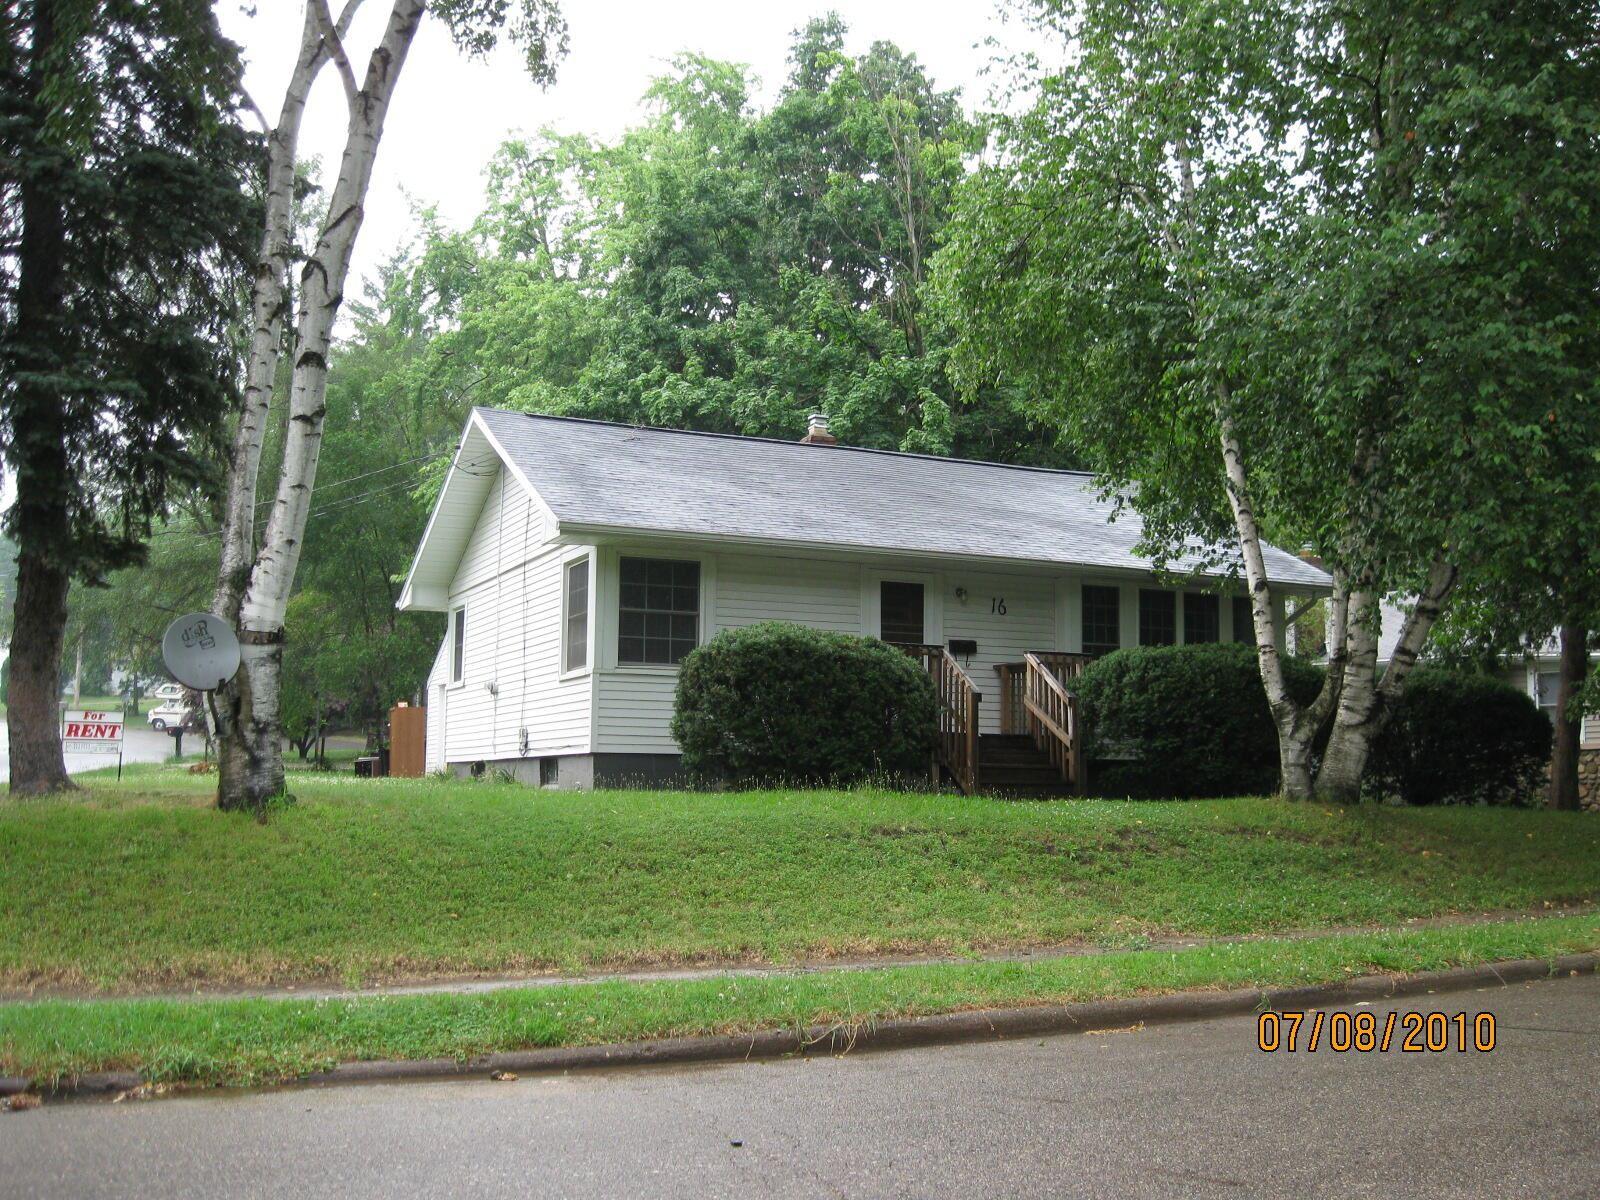 16 W Grand Cir Avenue, Battle Creek, MI 49037 - MLS#: 21026024